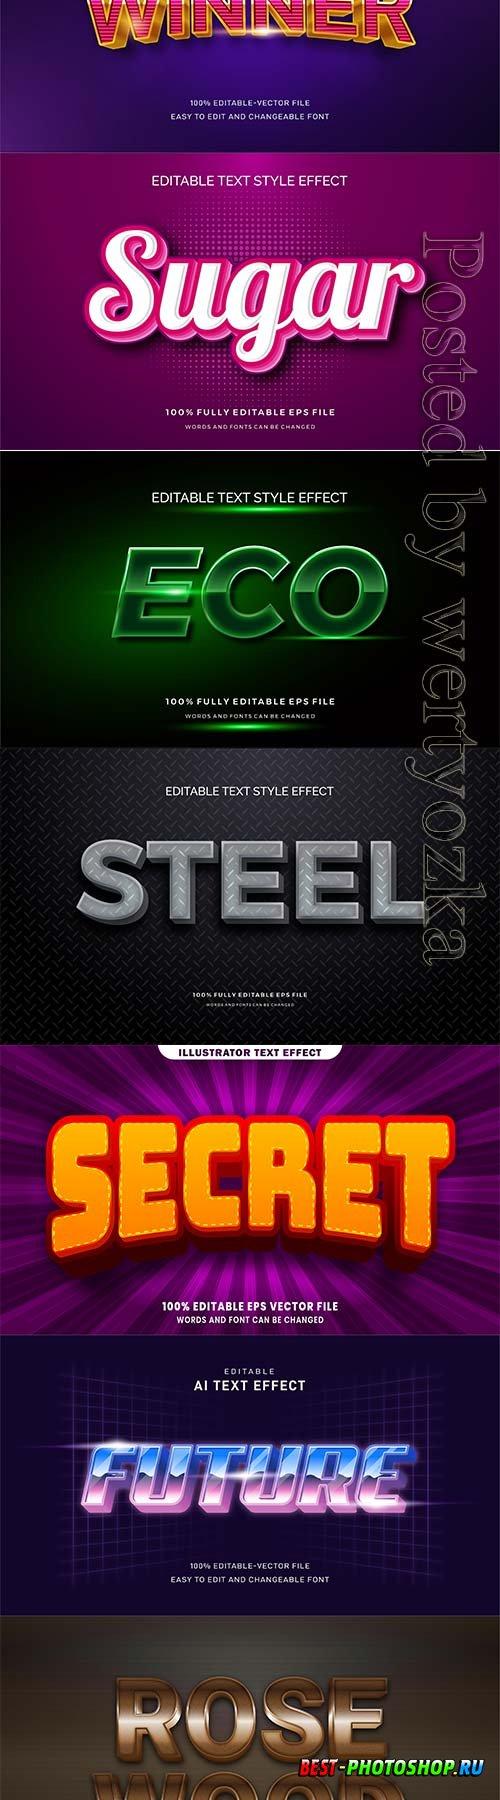 3d editable text style effect vector vol 306